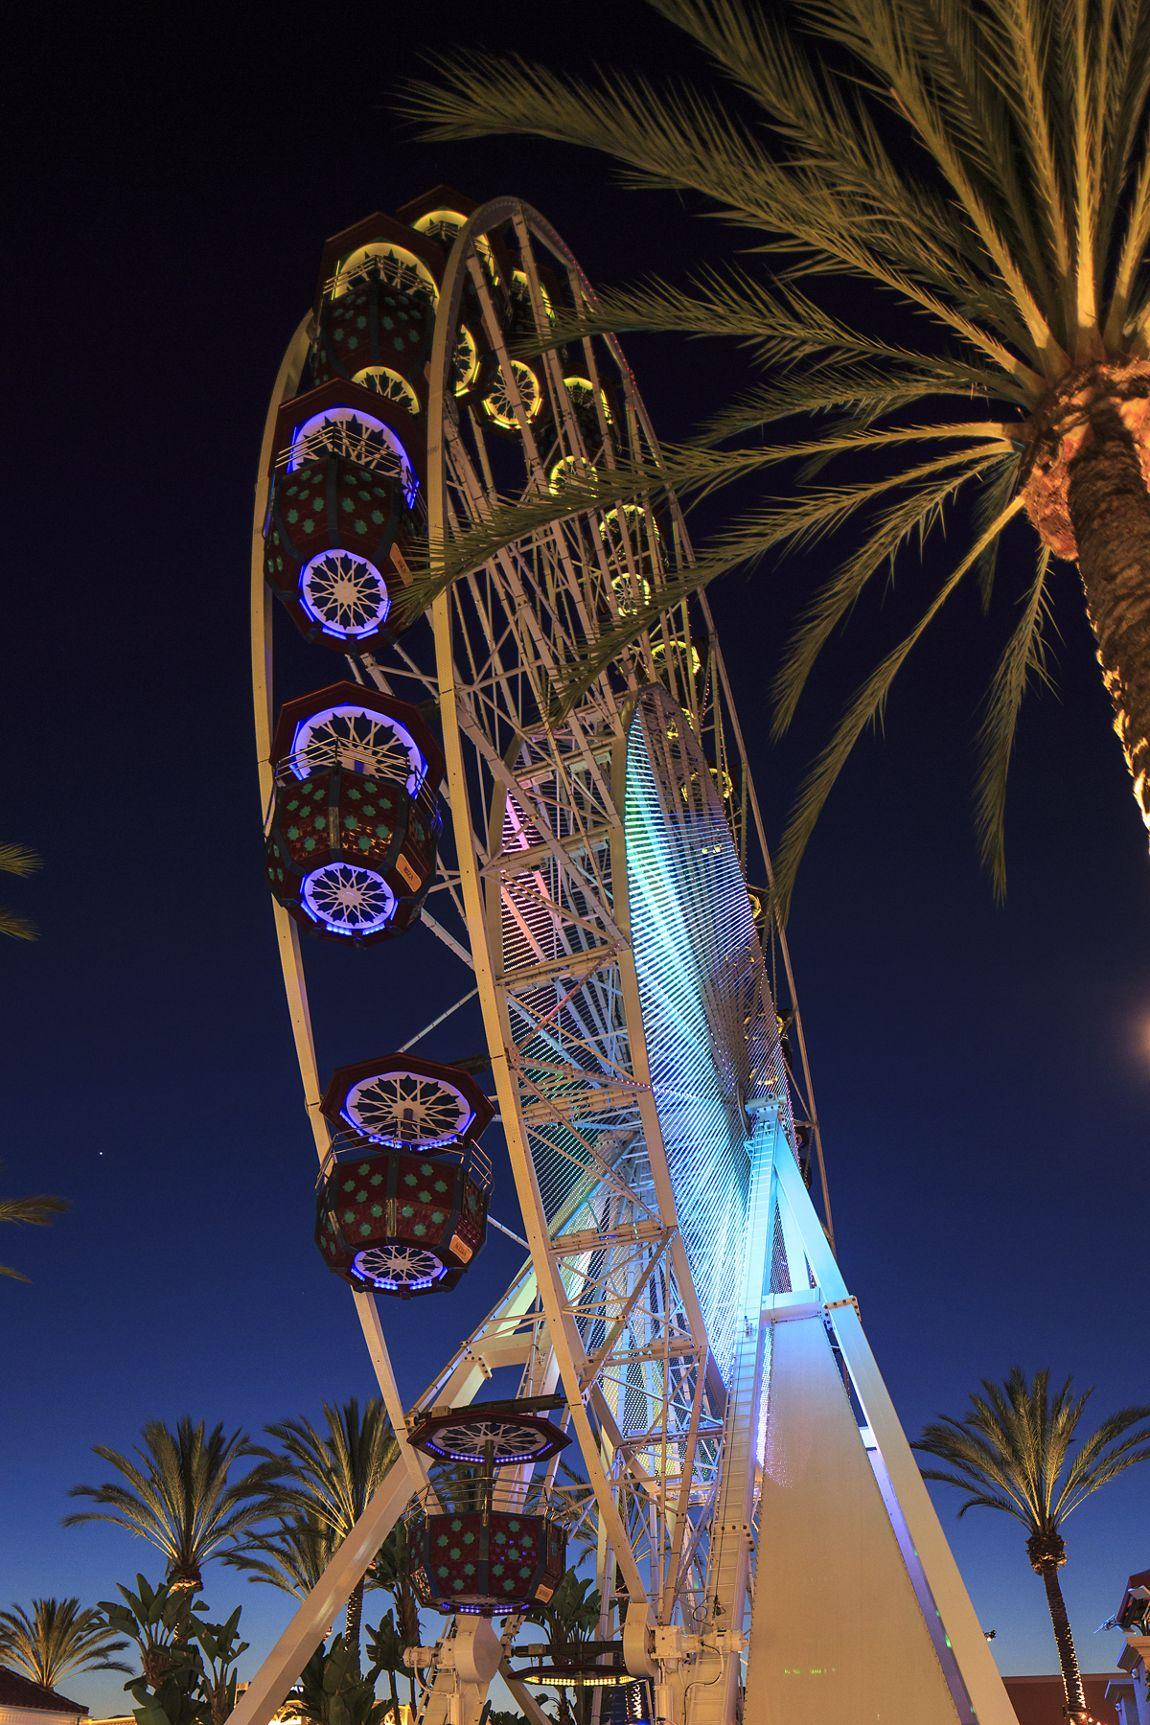 Giant Wheel at Irvine Spectrum Center. Lamb 2015.